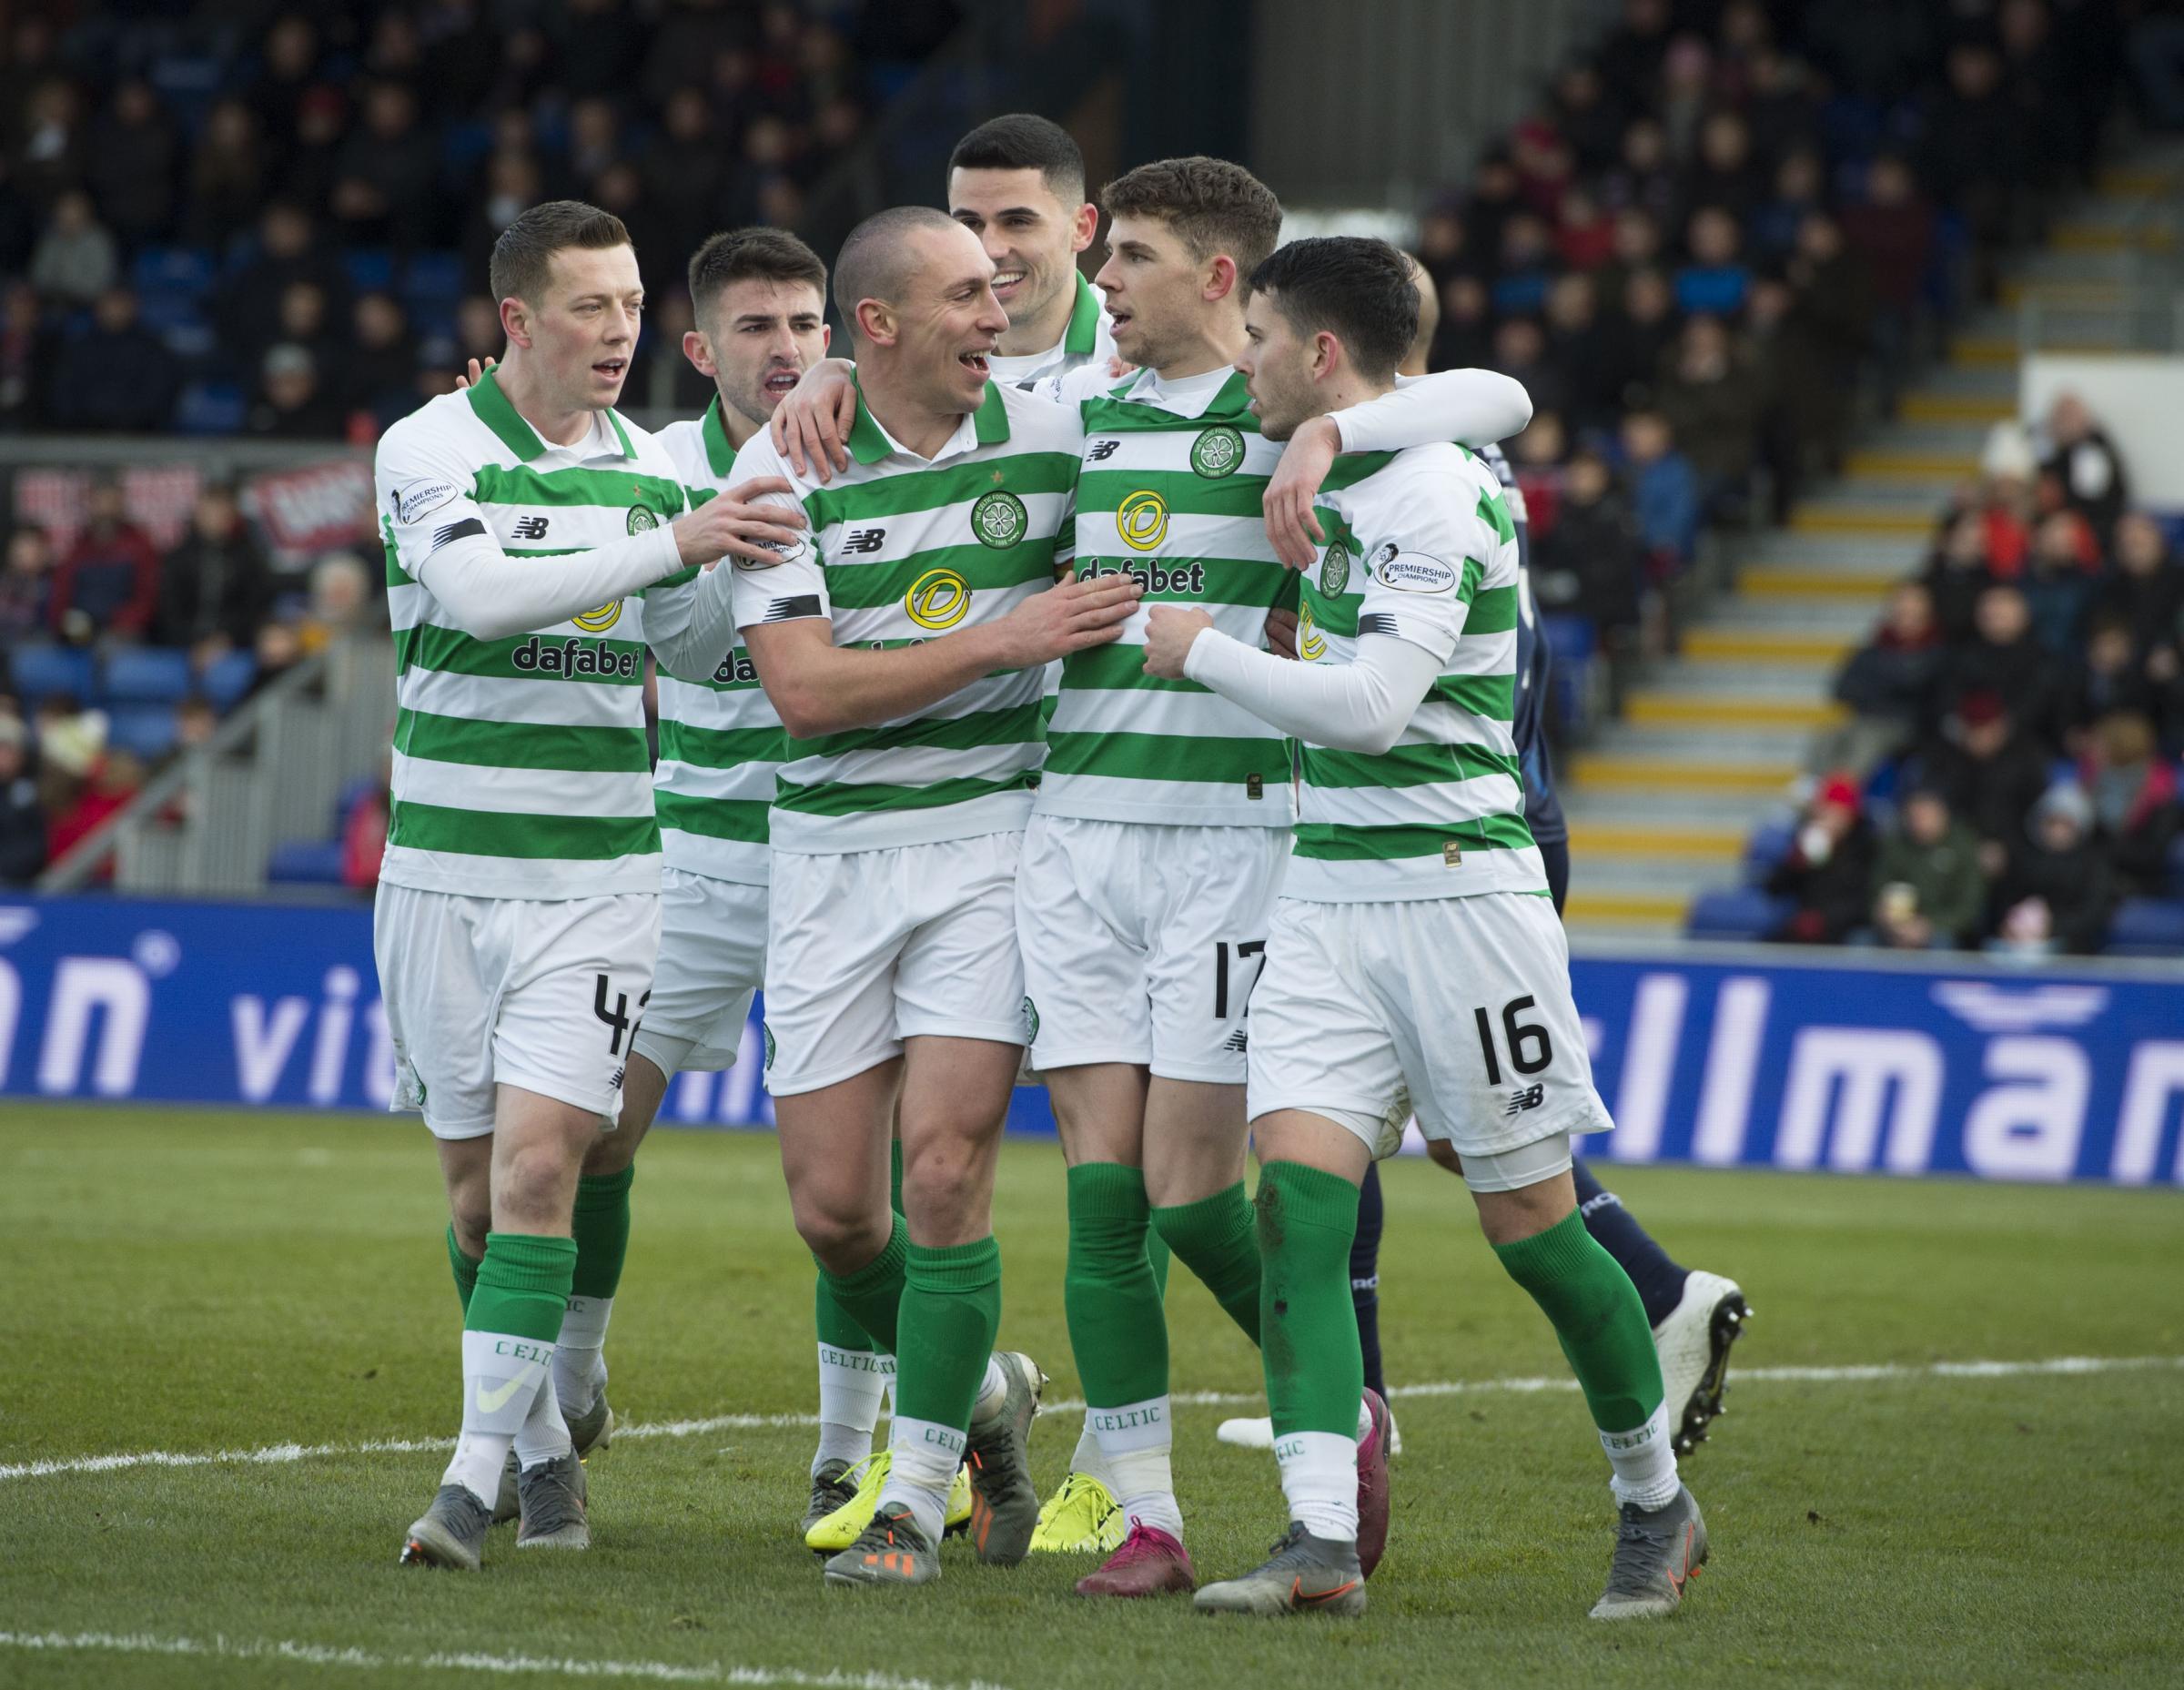 Ross County 1-4 Celtic as it happened Christie, Stewart, Rogic and Johnston on the scoresheet